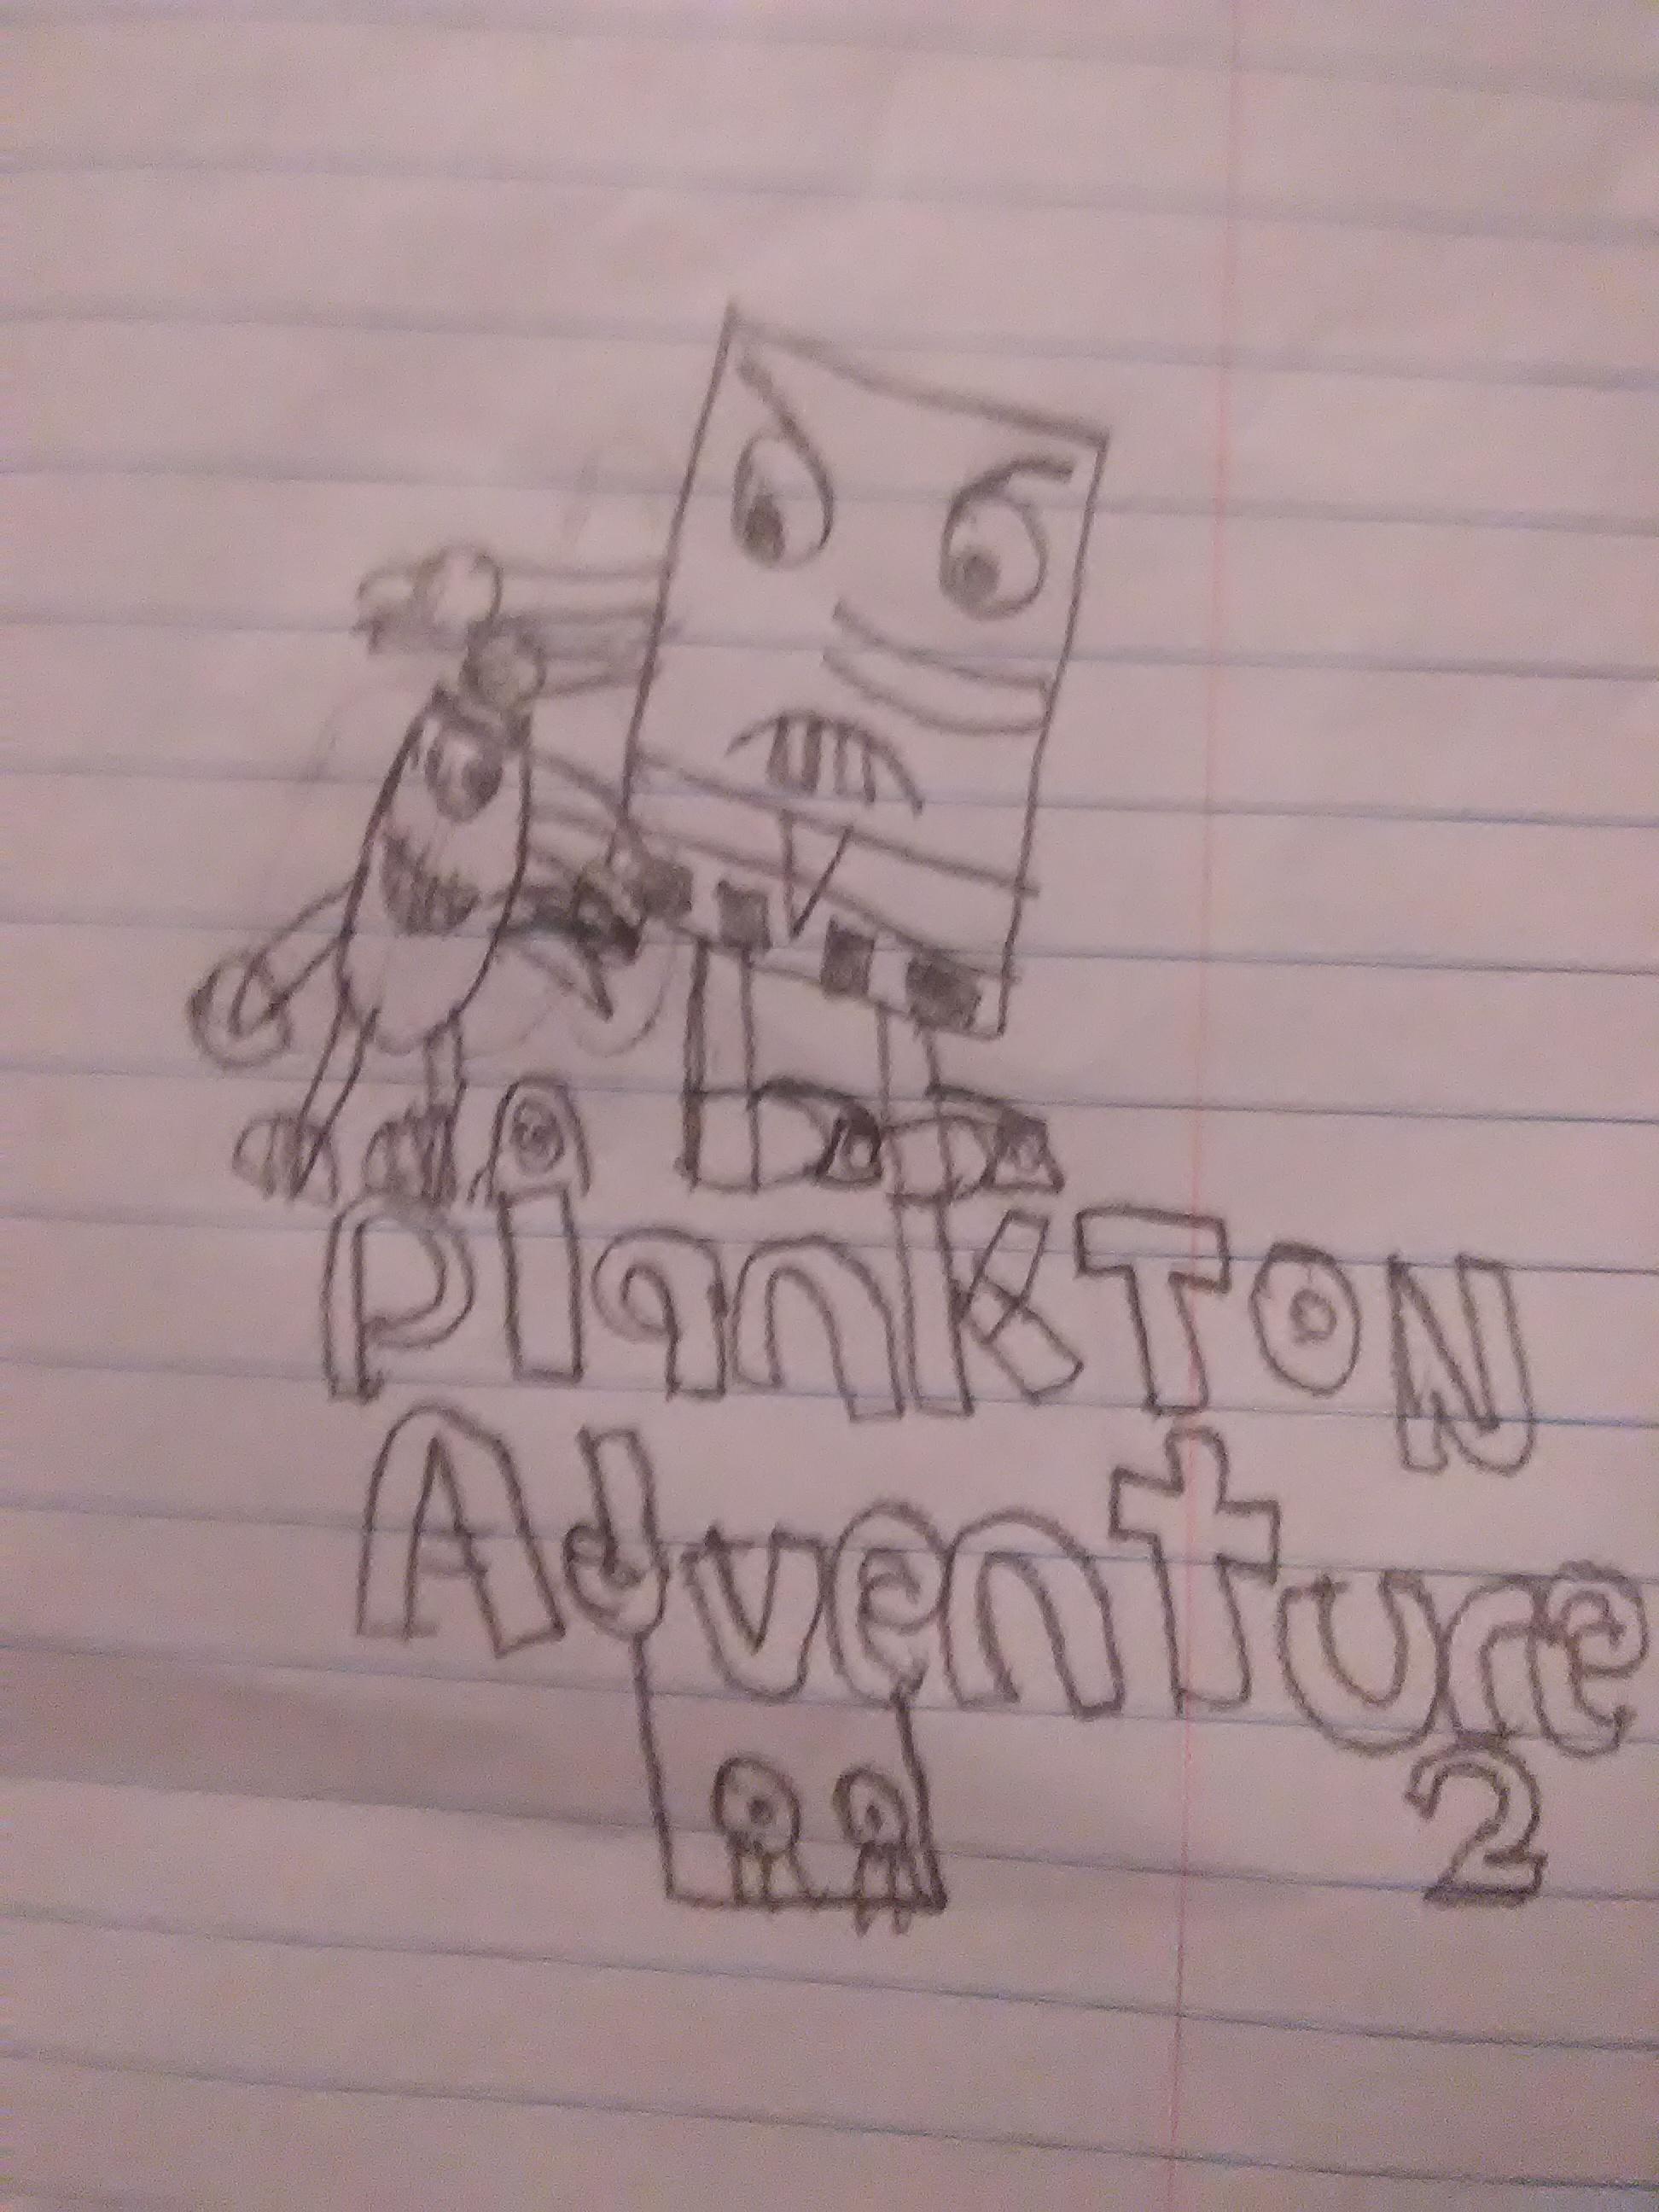 Plankton Adventure 2